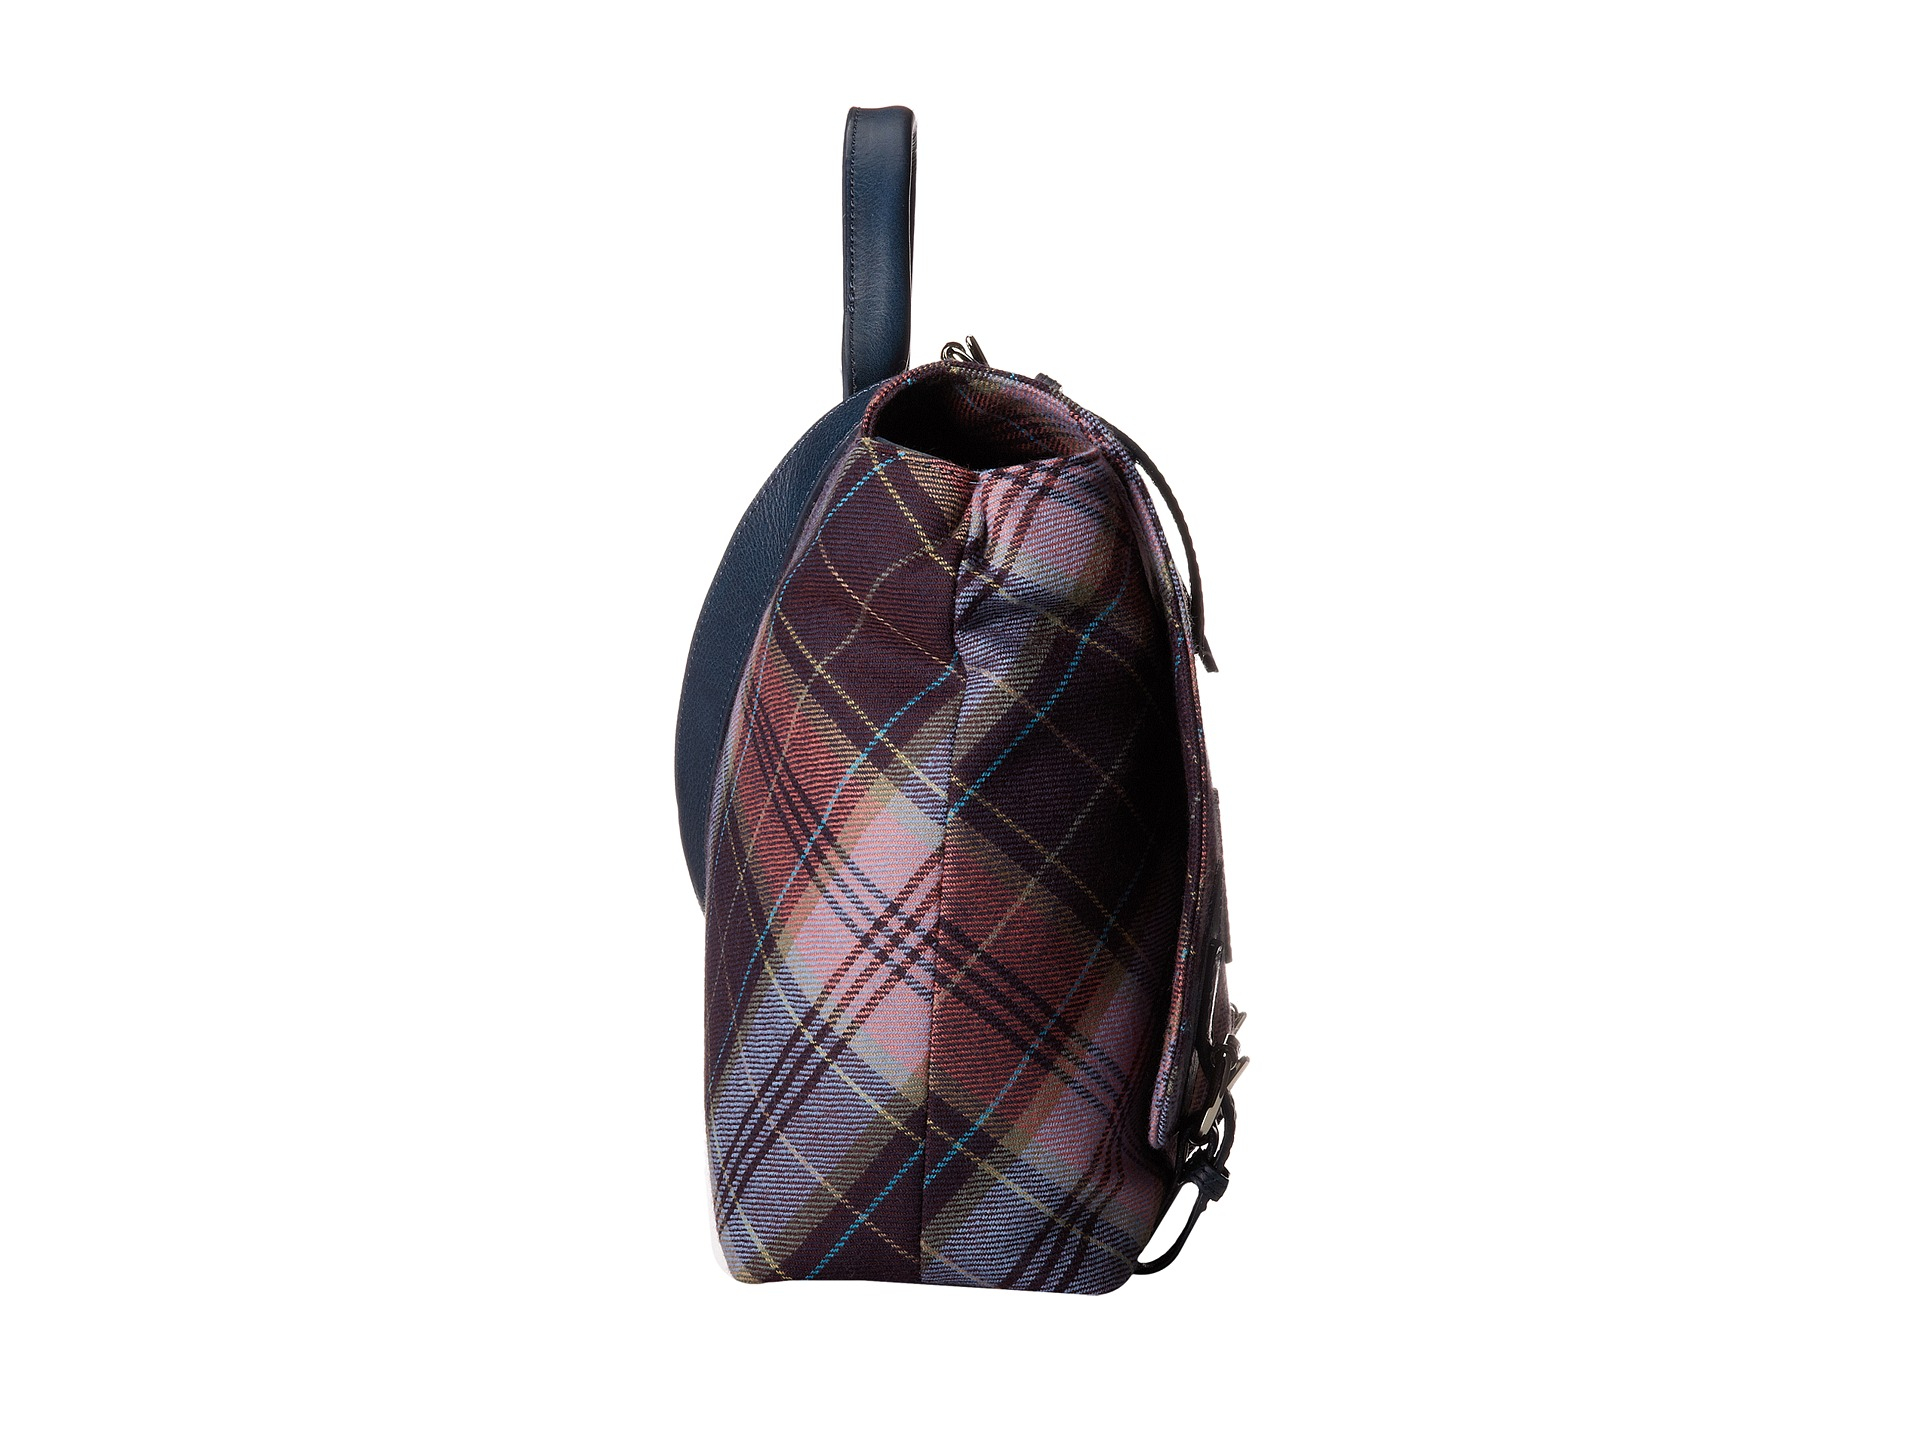 2ee465d1f25f Lyst - Vivienne Westwood New Tartan Positano Bag in Pink for Men